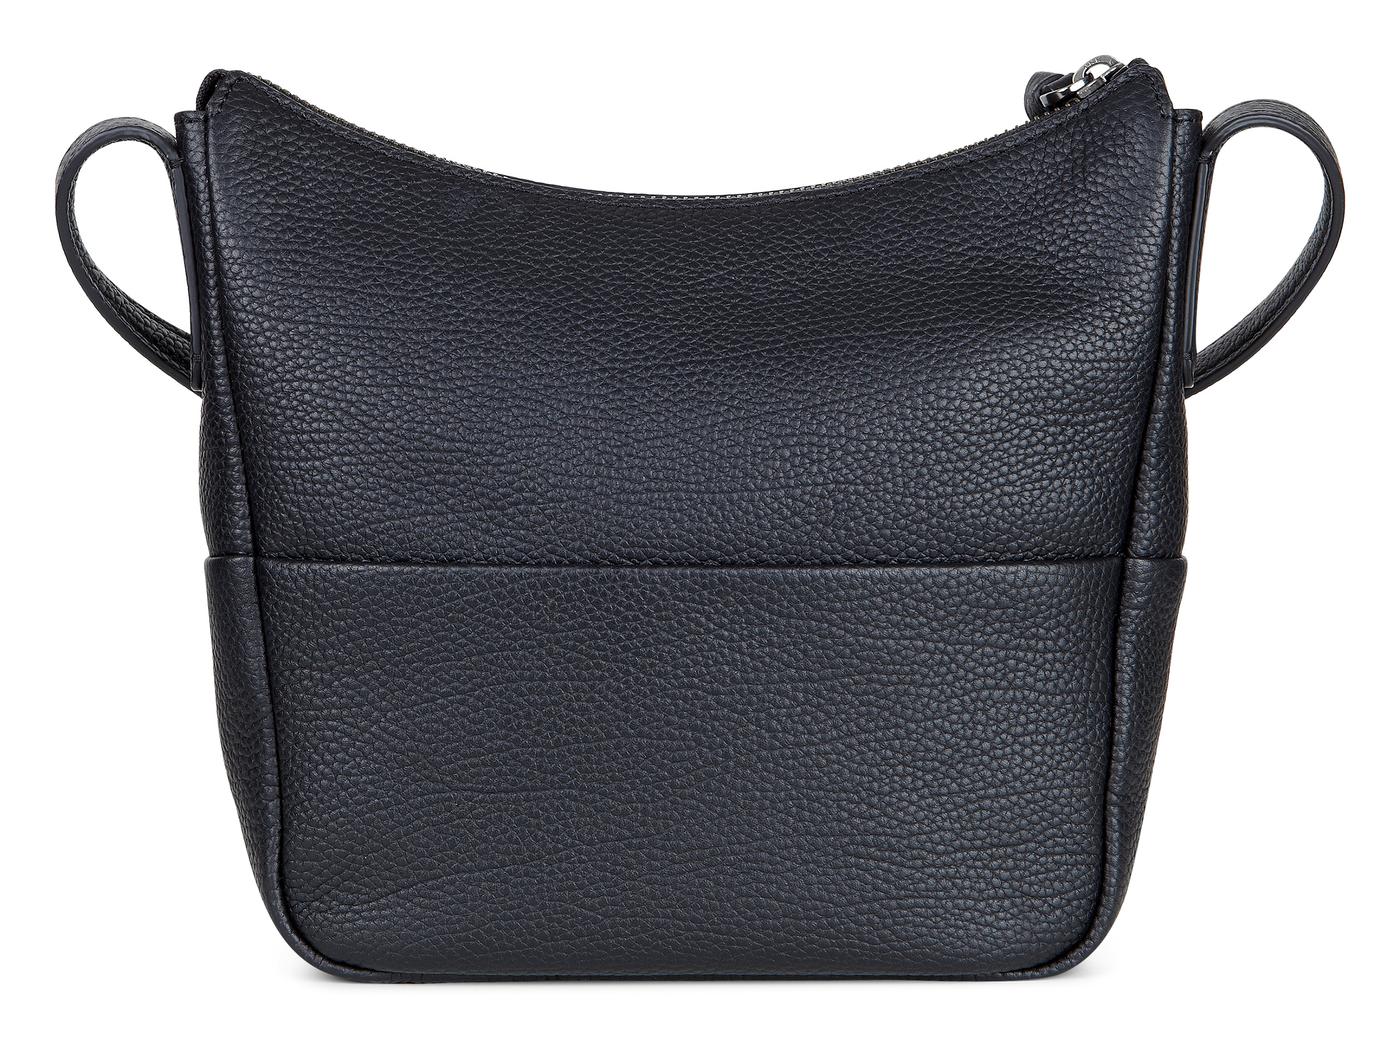 ECCO SP Small Hobo Bag